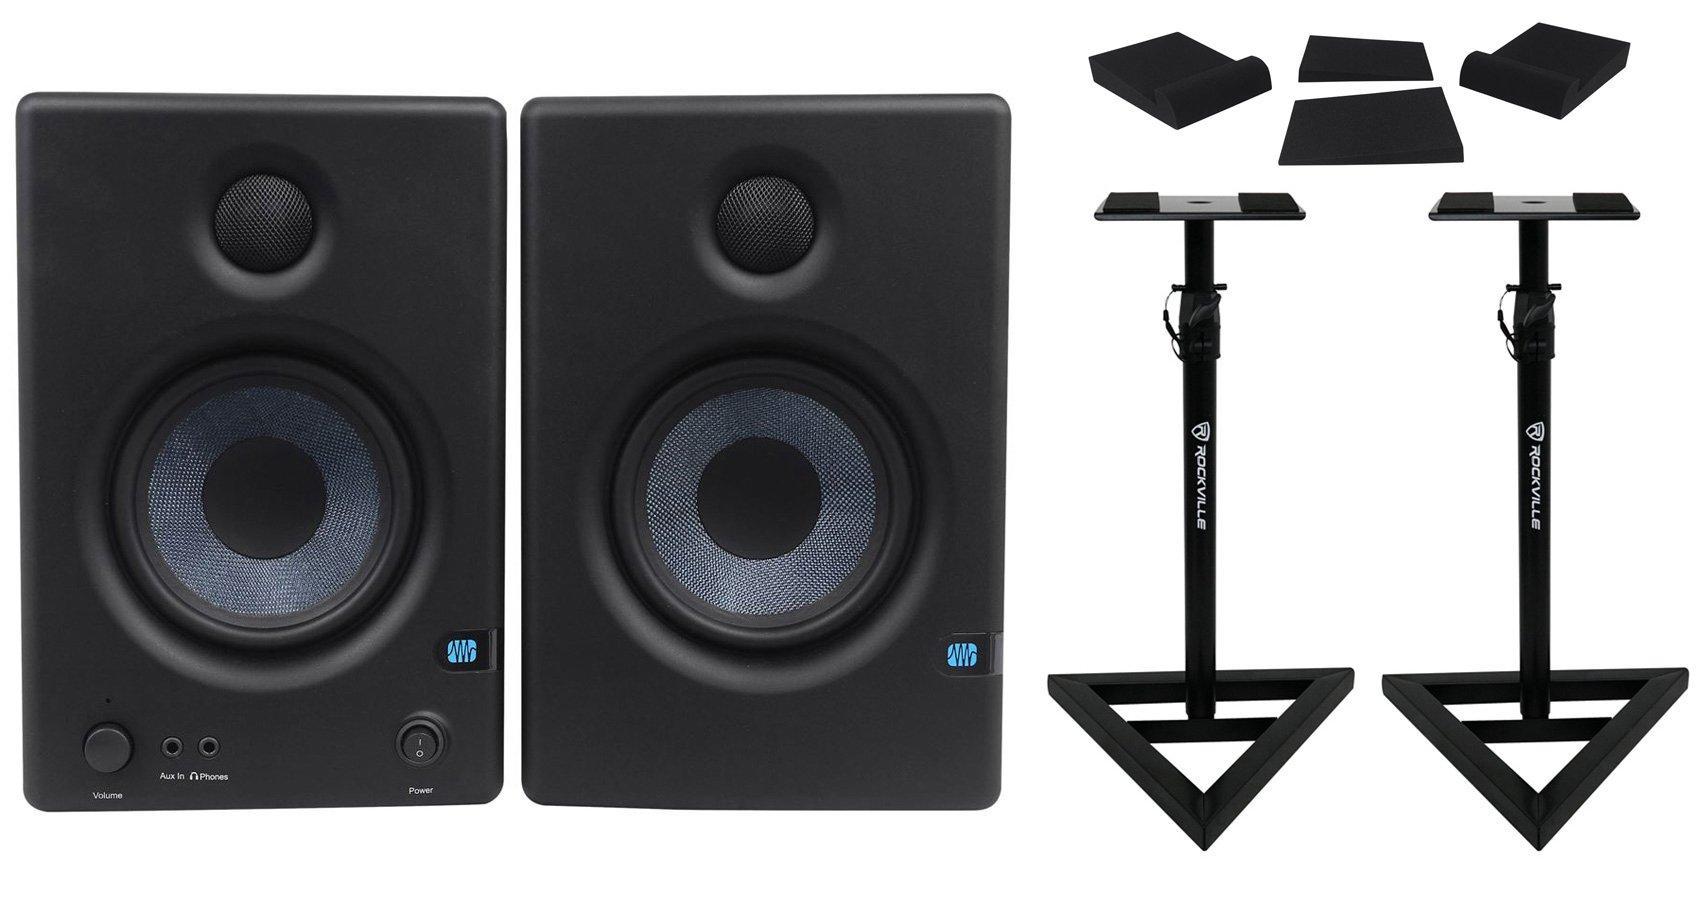 Package: Pair of Presonus Eris E4.5 2-Way 4.5'' Near Field Active/Powered Studio Monitors+ Pair of Rockville RVSM1 Heavy Duty Near-Field Studio Monitor Stands + Pair of Foam Isolation Pads